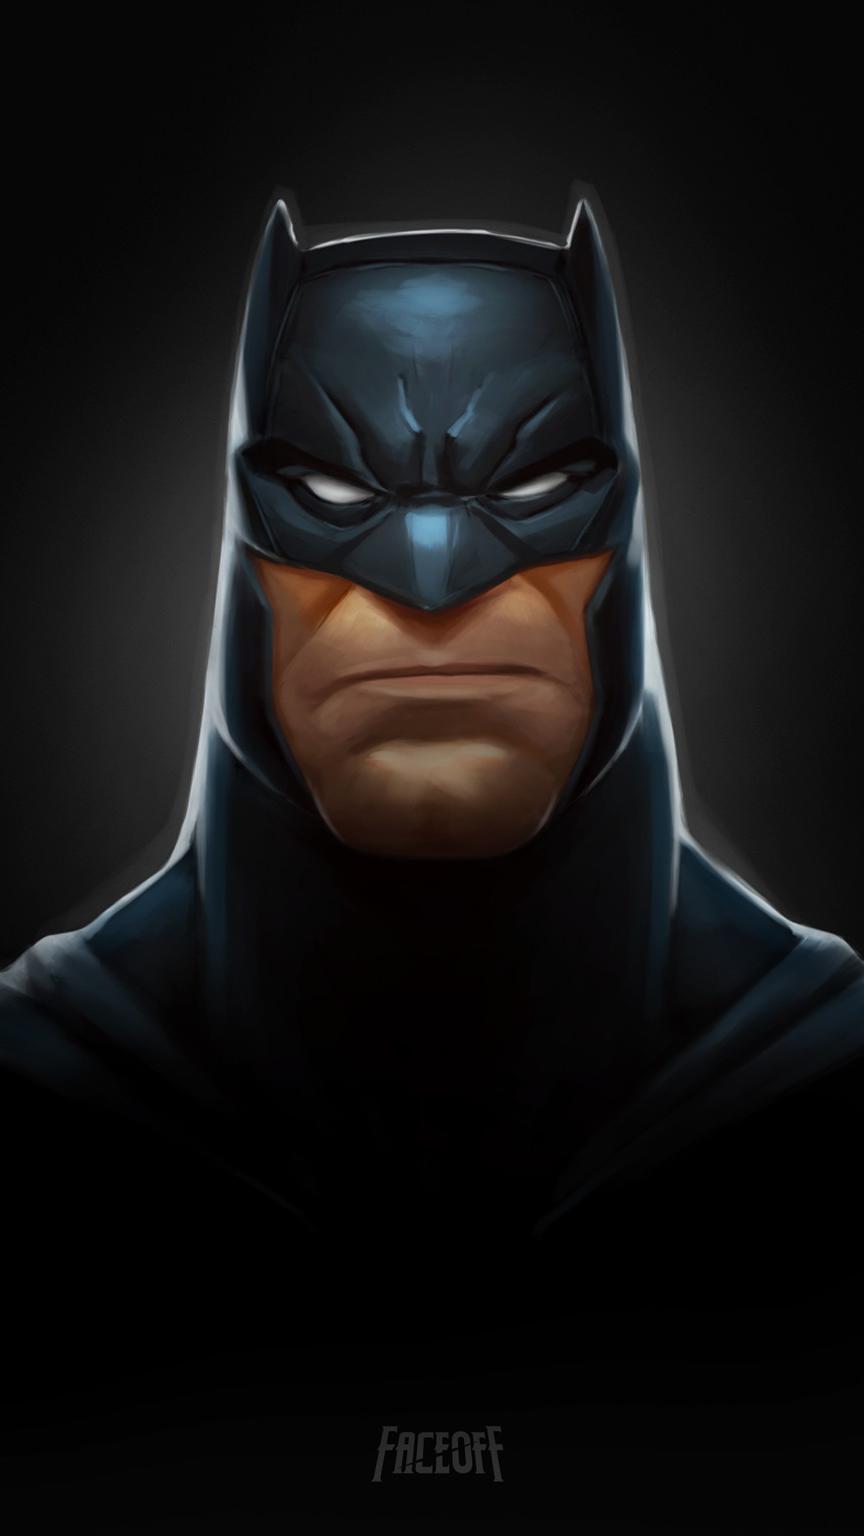 Batman Face iPhone Wallpaper